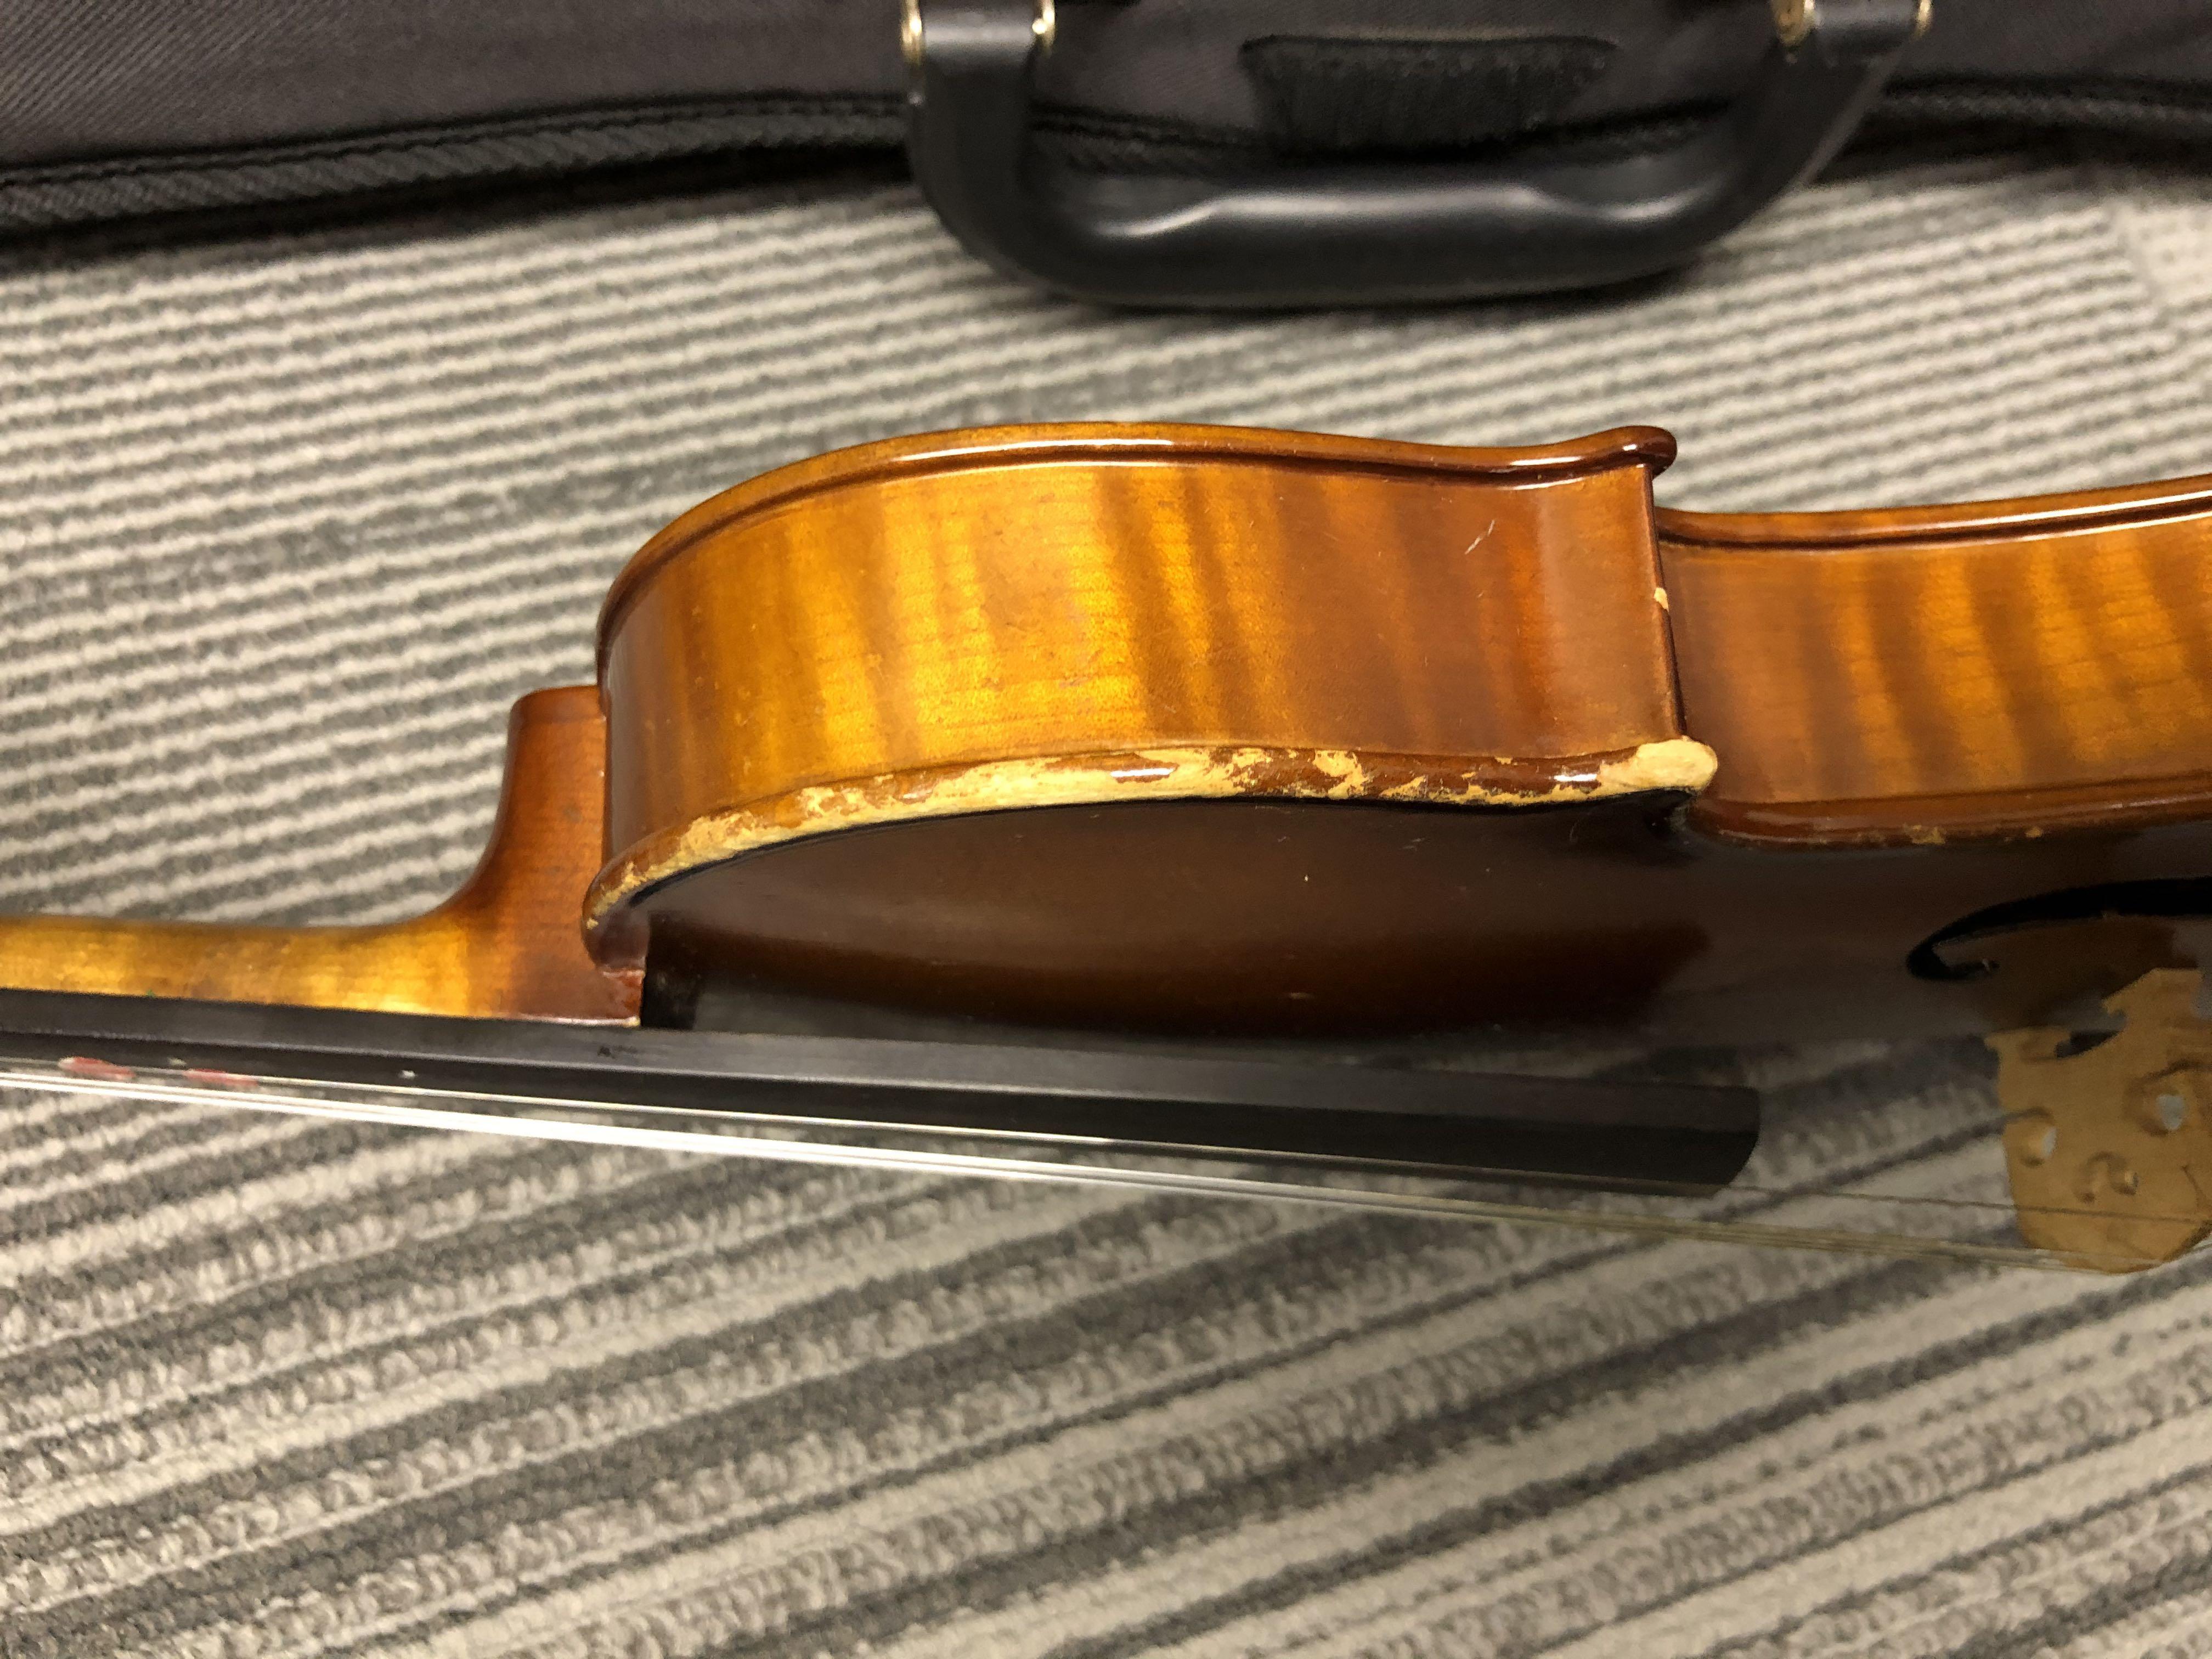 Violmaster Prima Violin (size 1/4) #newbieOct19